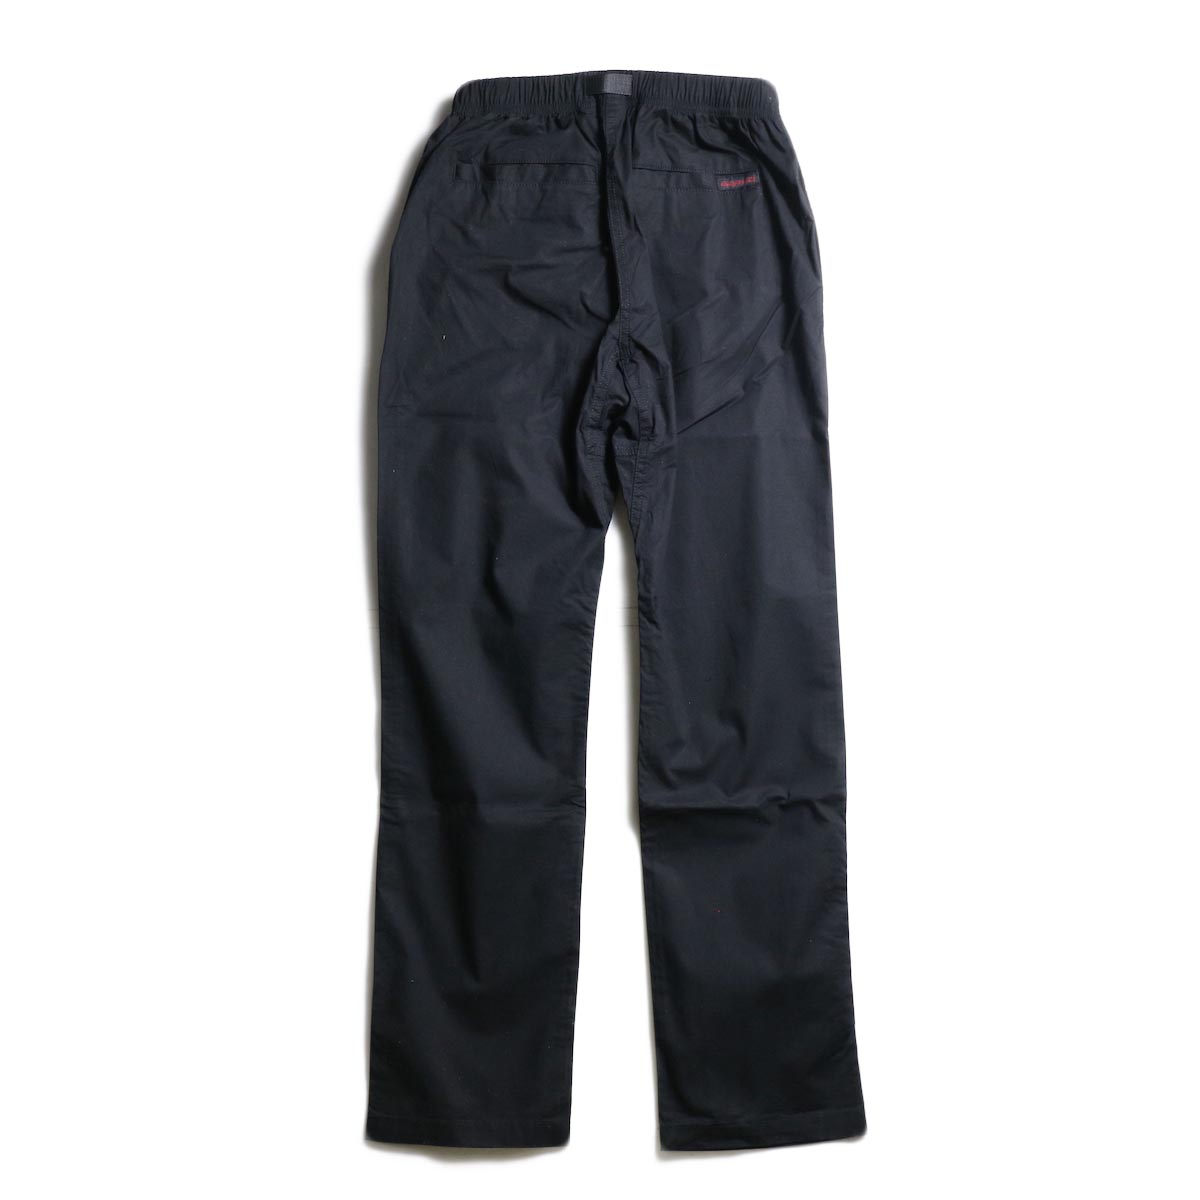 GRAMICCI / Weather NN-Pants Just Cut (Black) 背面